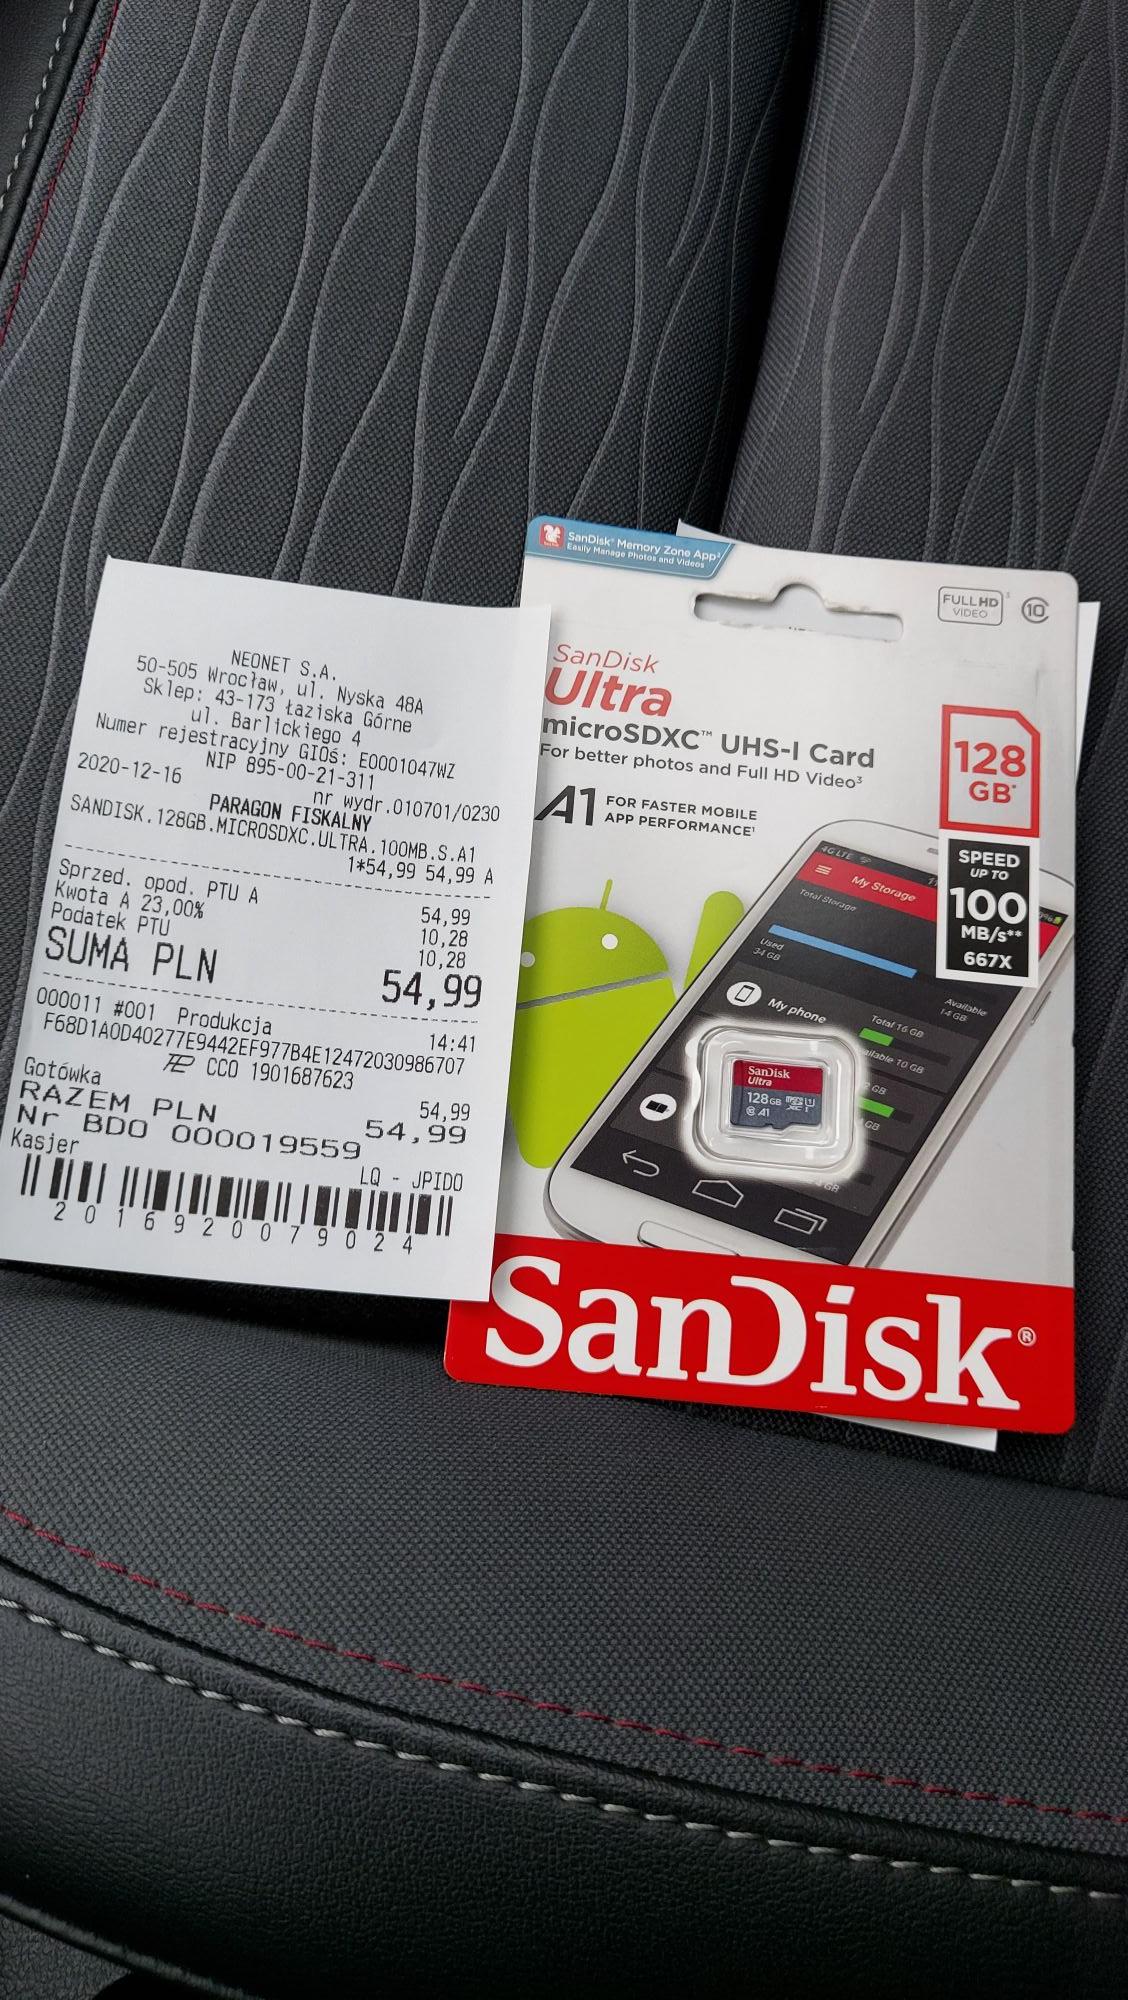 Karta pamięci sandisk 128 gb microSDXC ultra 100 mb/s